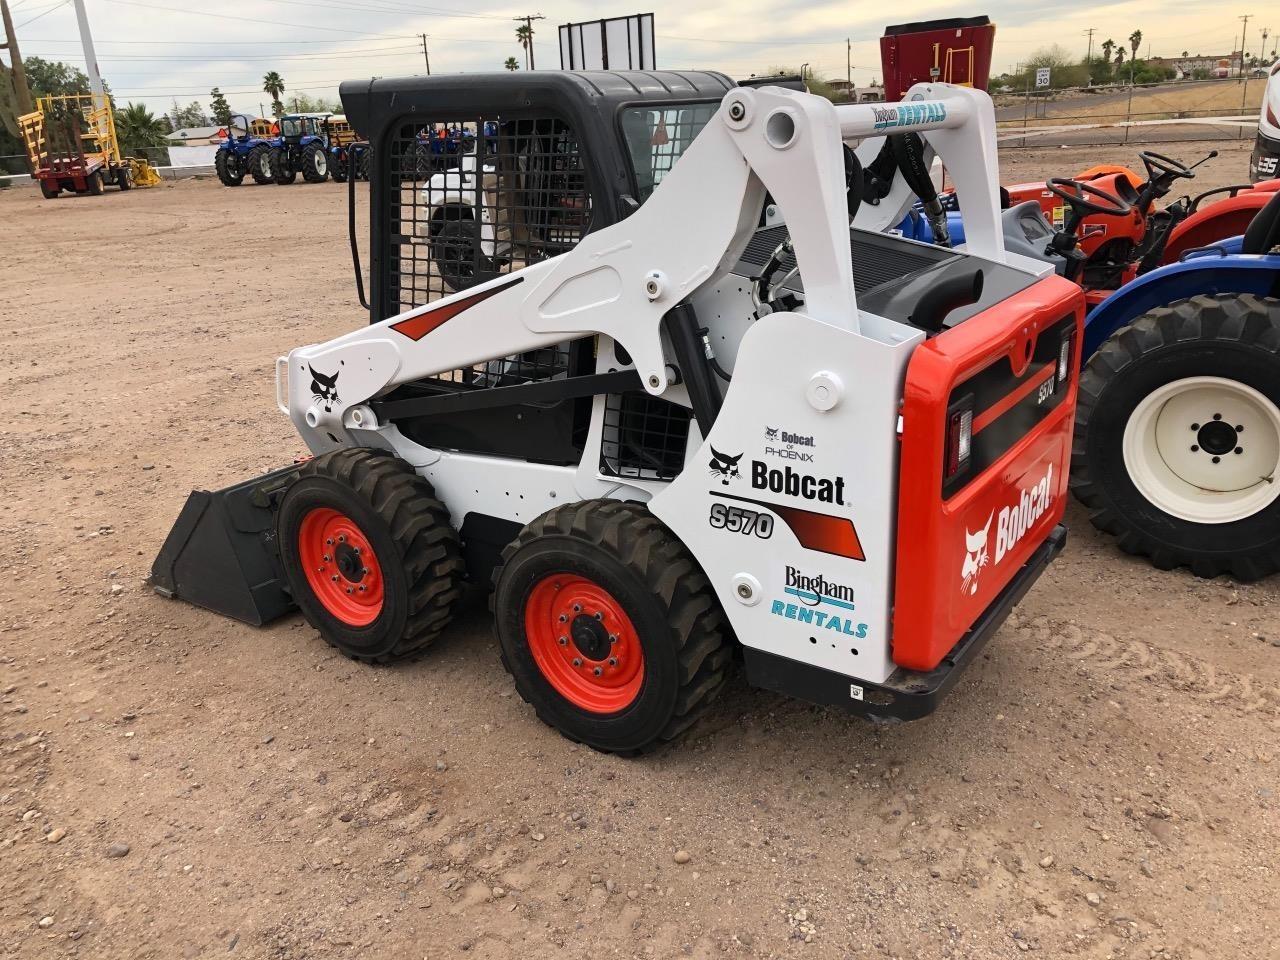 2019 Bobcat S570 Skid Steer